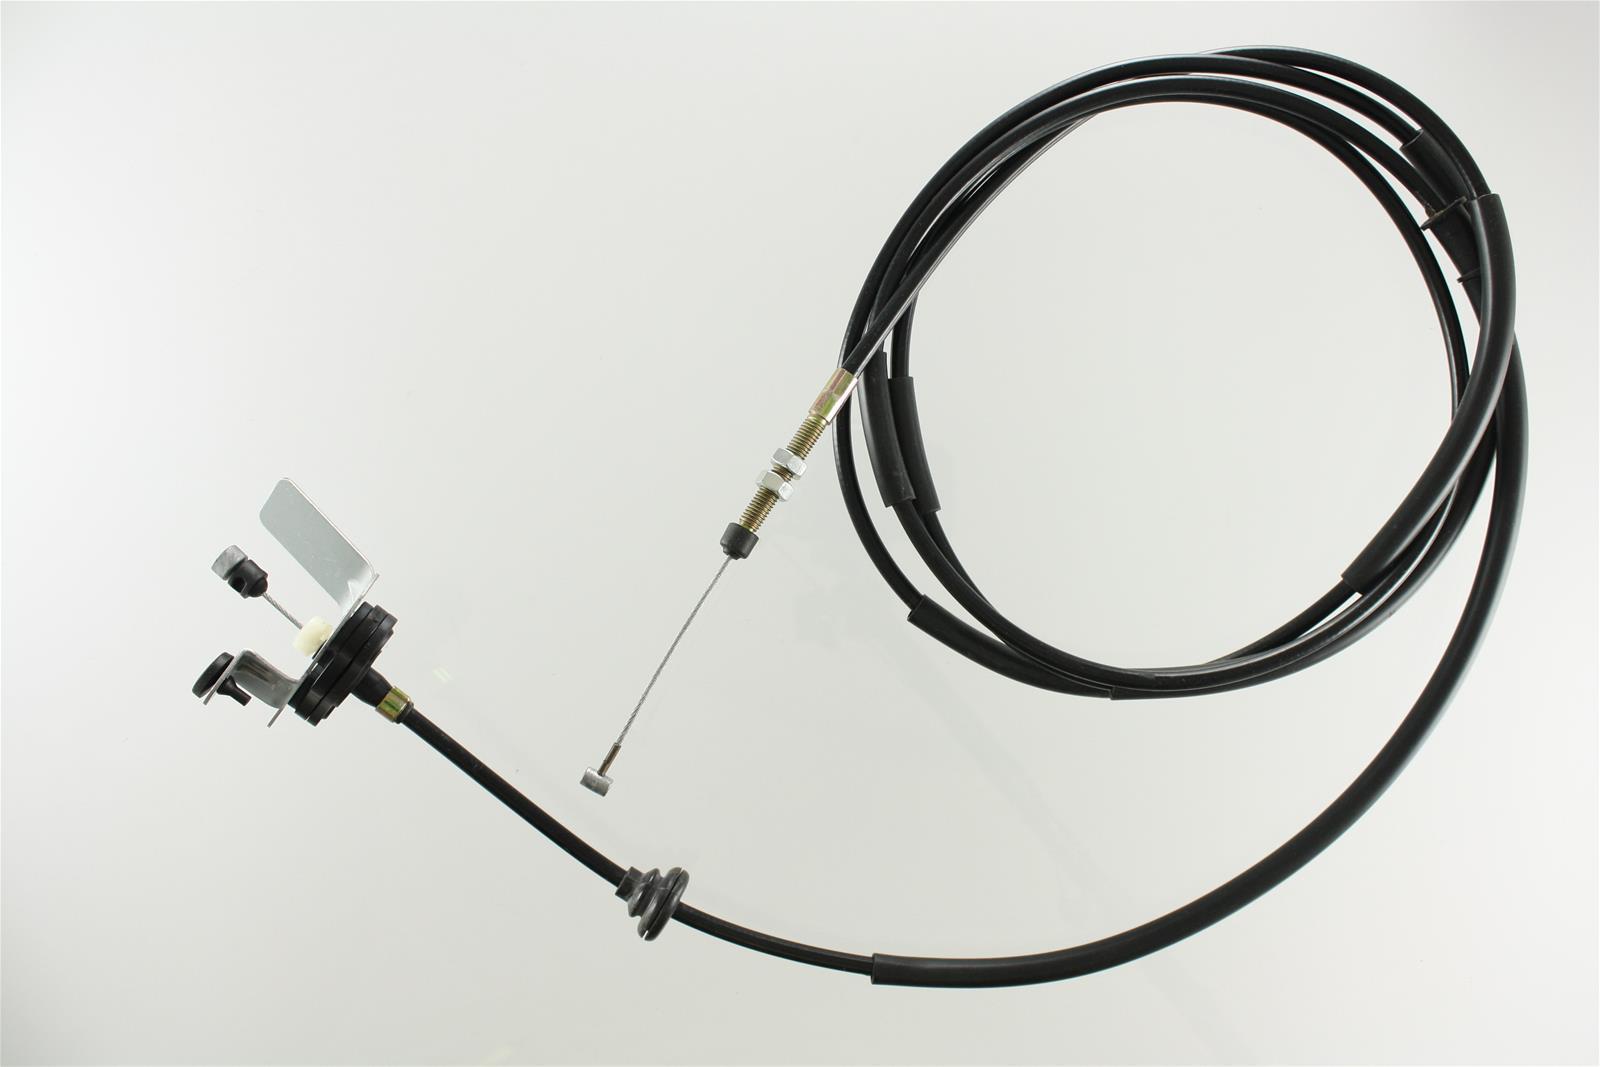 ATP Y-1212 Accelerator Cable